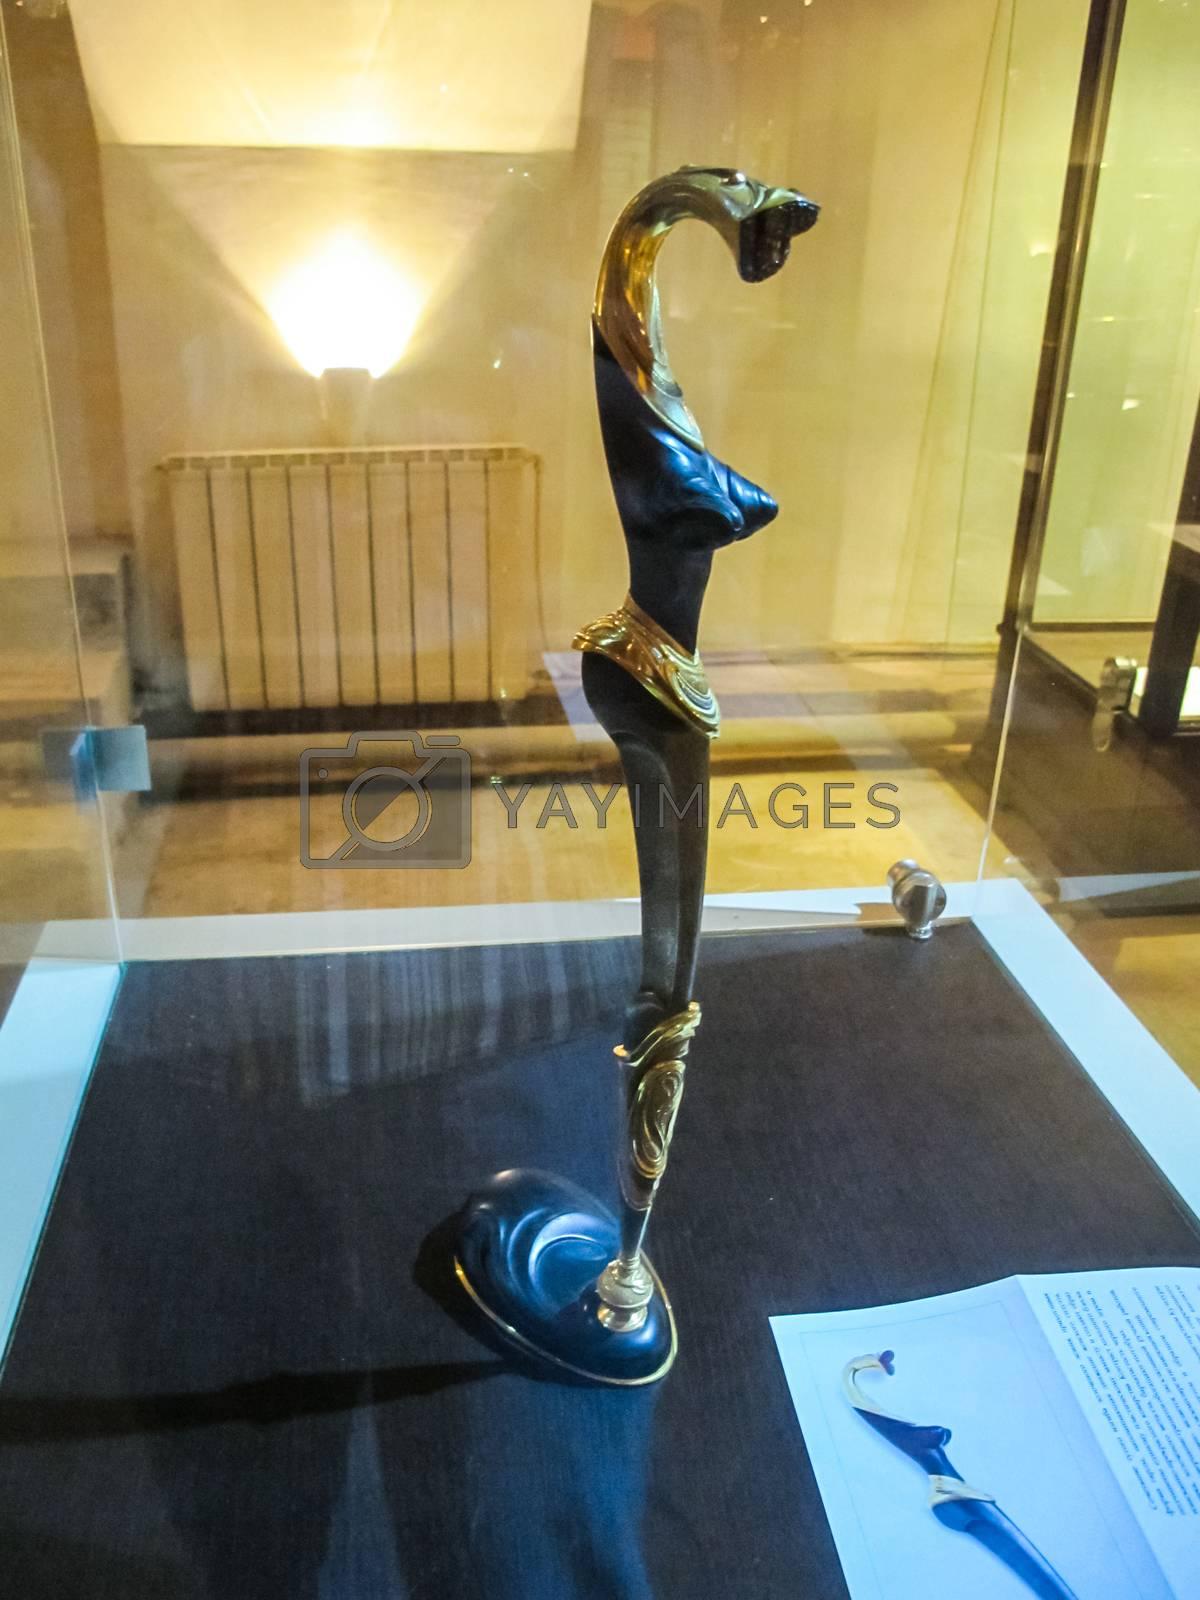 St Petersburg, Russia - June 14, 2018: Museum of Blade Weapons. Exhibits of swords, swords and daggers. Swords, machetes and other cold steel.